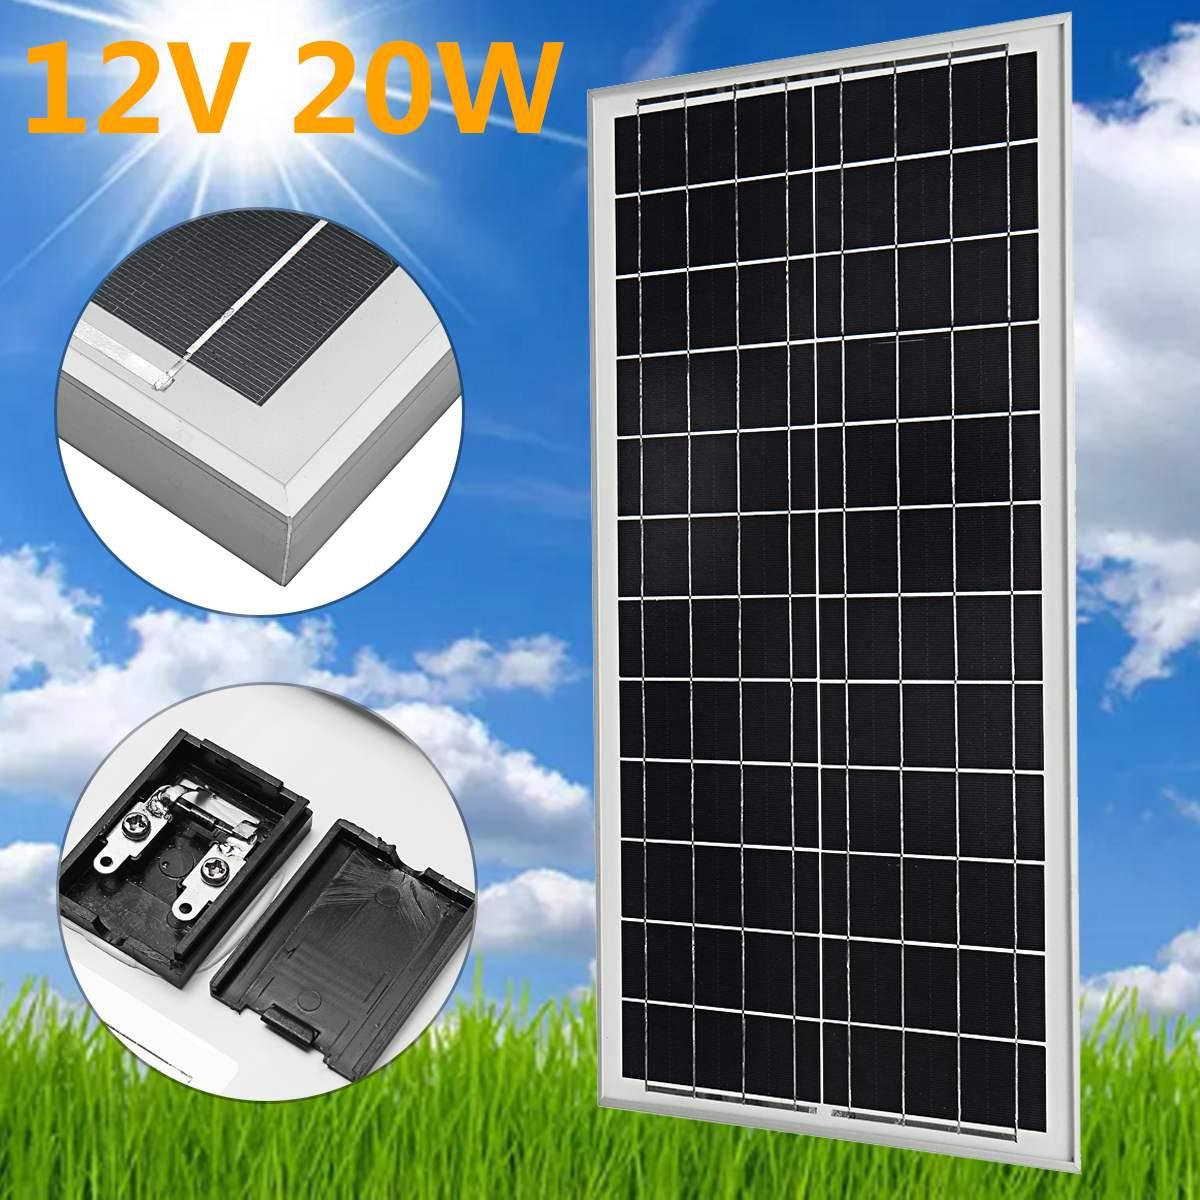 KINCO Steady 12V 20W Polycrystalline Solar panels High Conversion Rate DIY Solar Power System For Housing Car Battery 100w 12v monocrystalline solar panel for 12v battery rv boat car home solar power